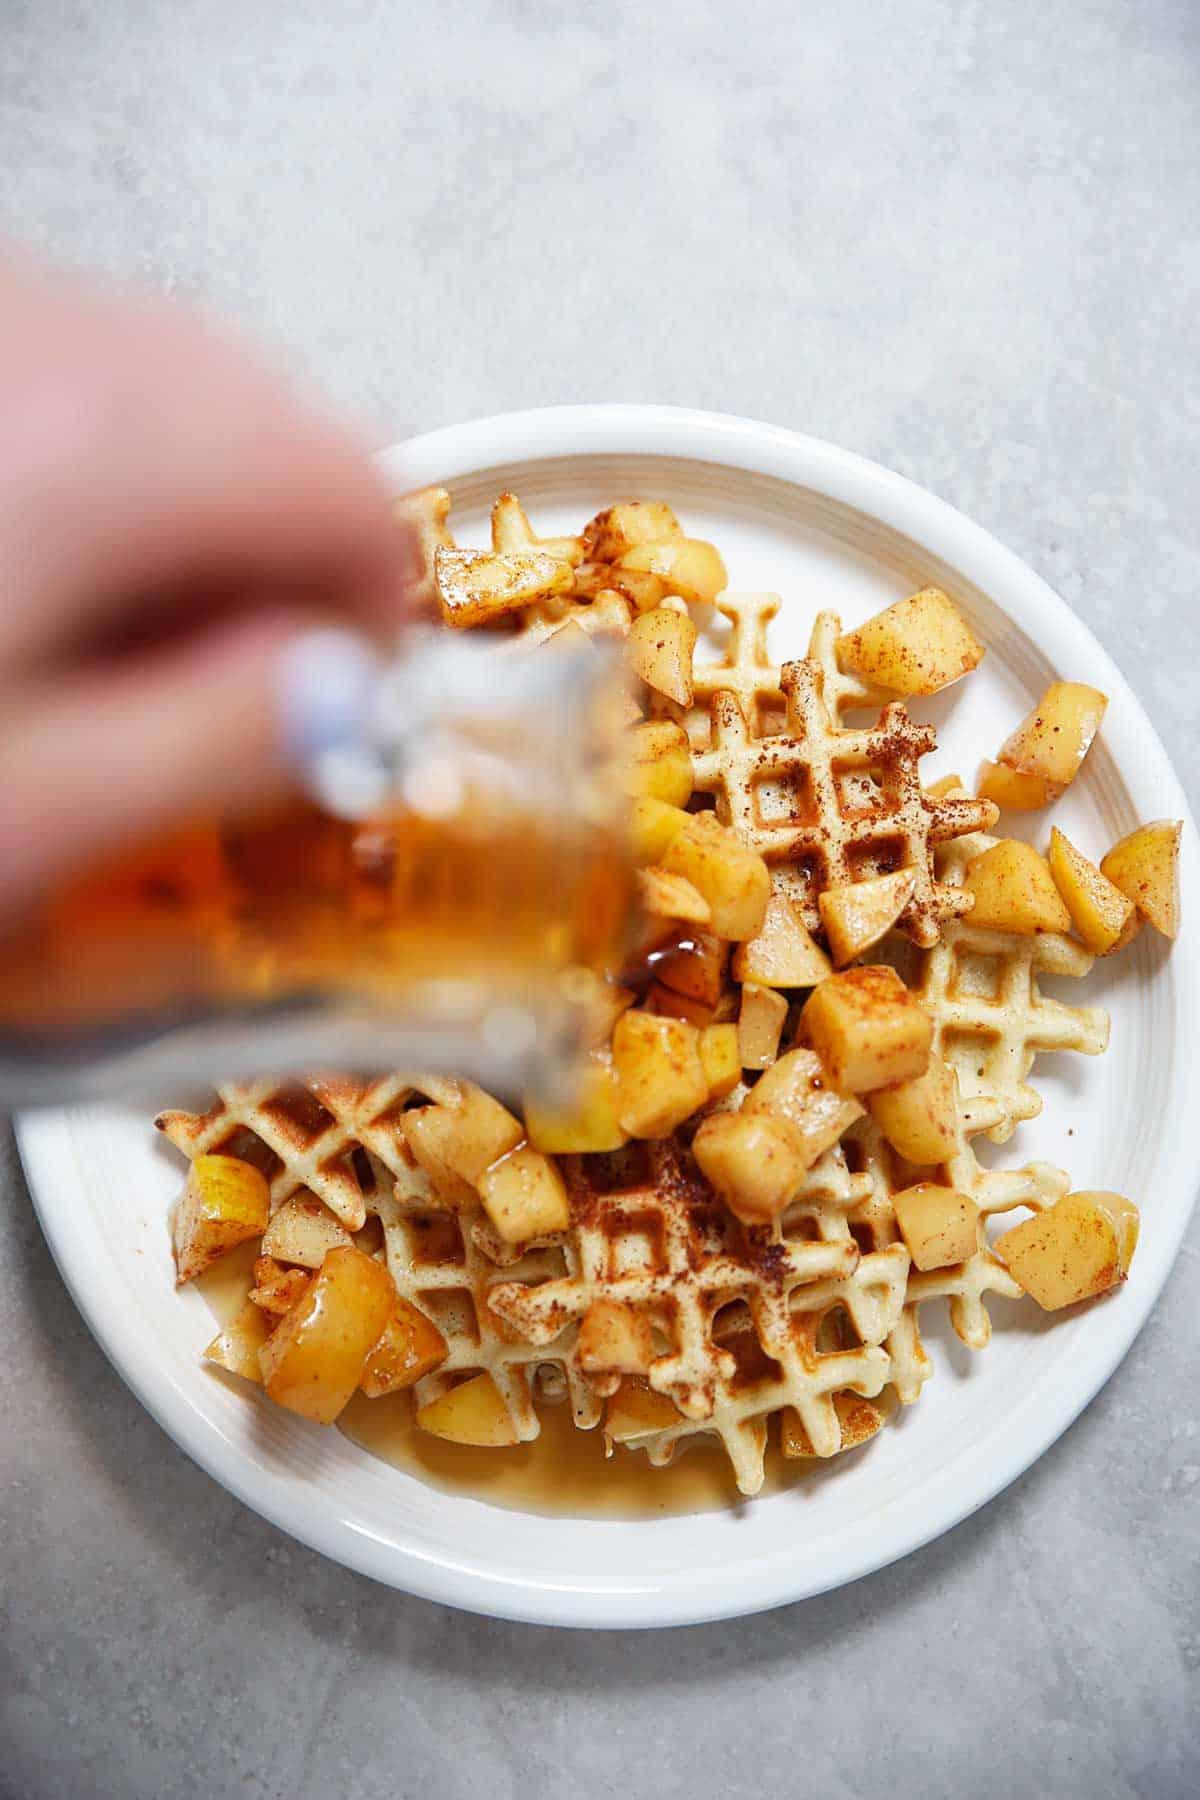 Freezer Friendly Waffle Bites Caramelized Apples